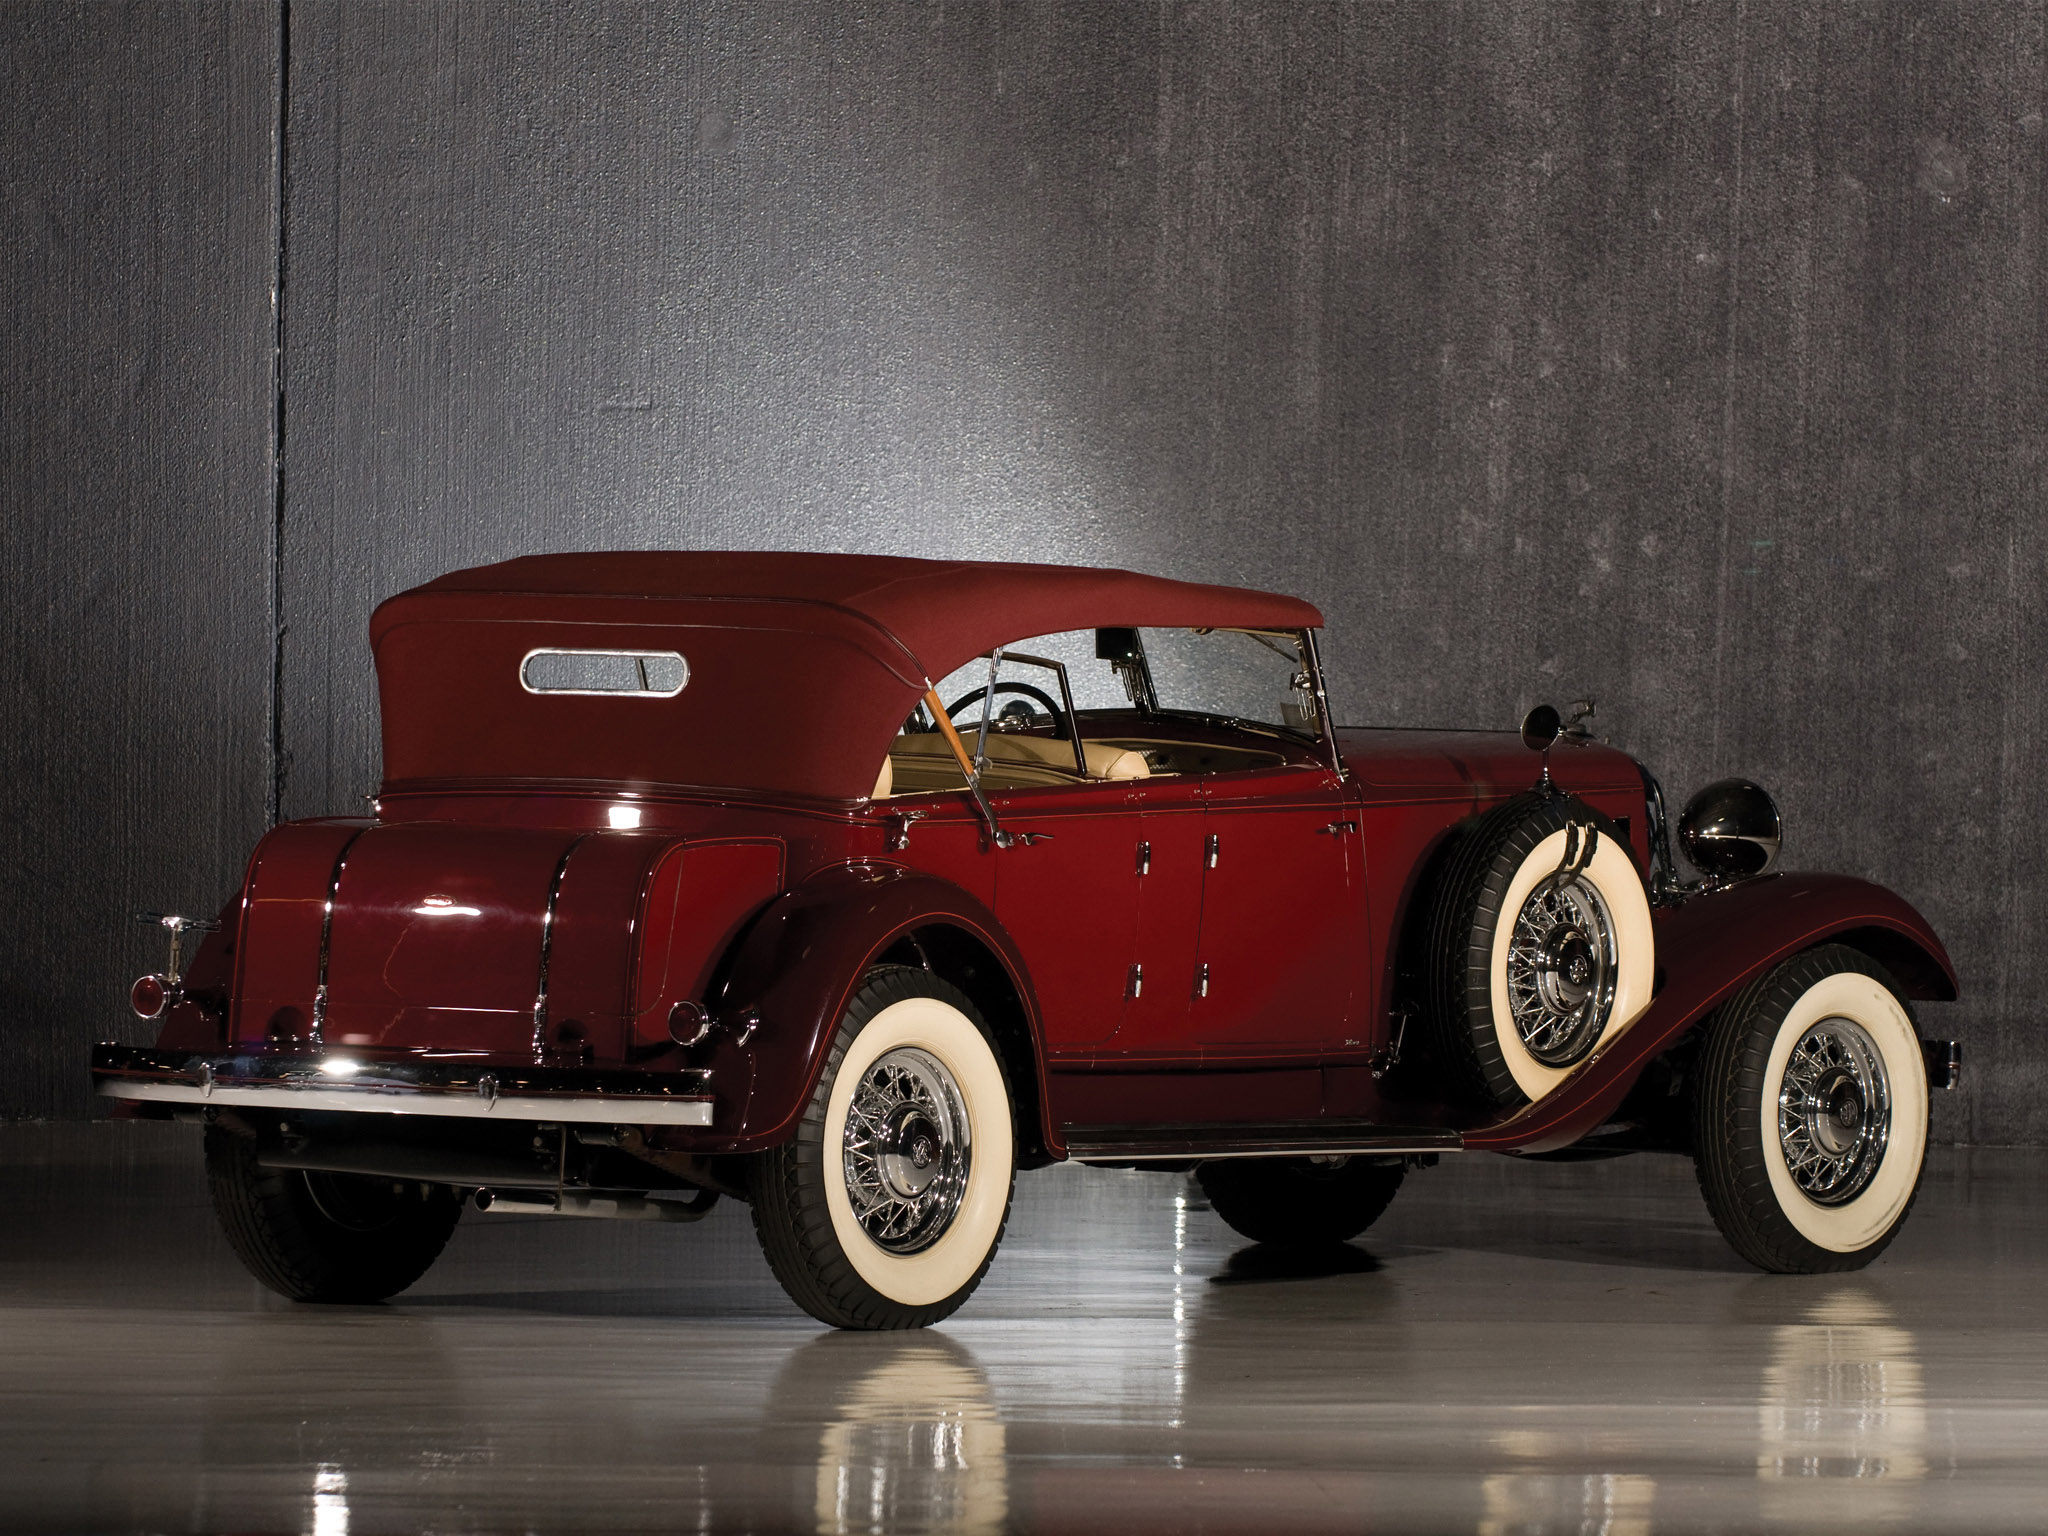 High Resolution Wallpaper | 1933 Chrysler Cl Imperial Sport Phaeton 2048x1536 px